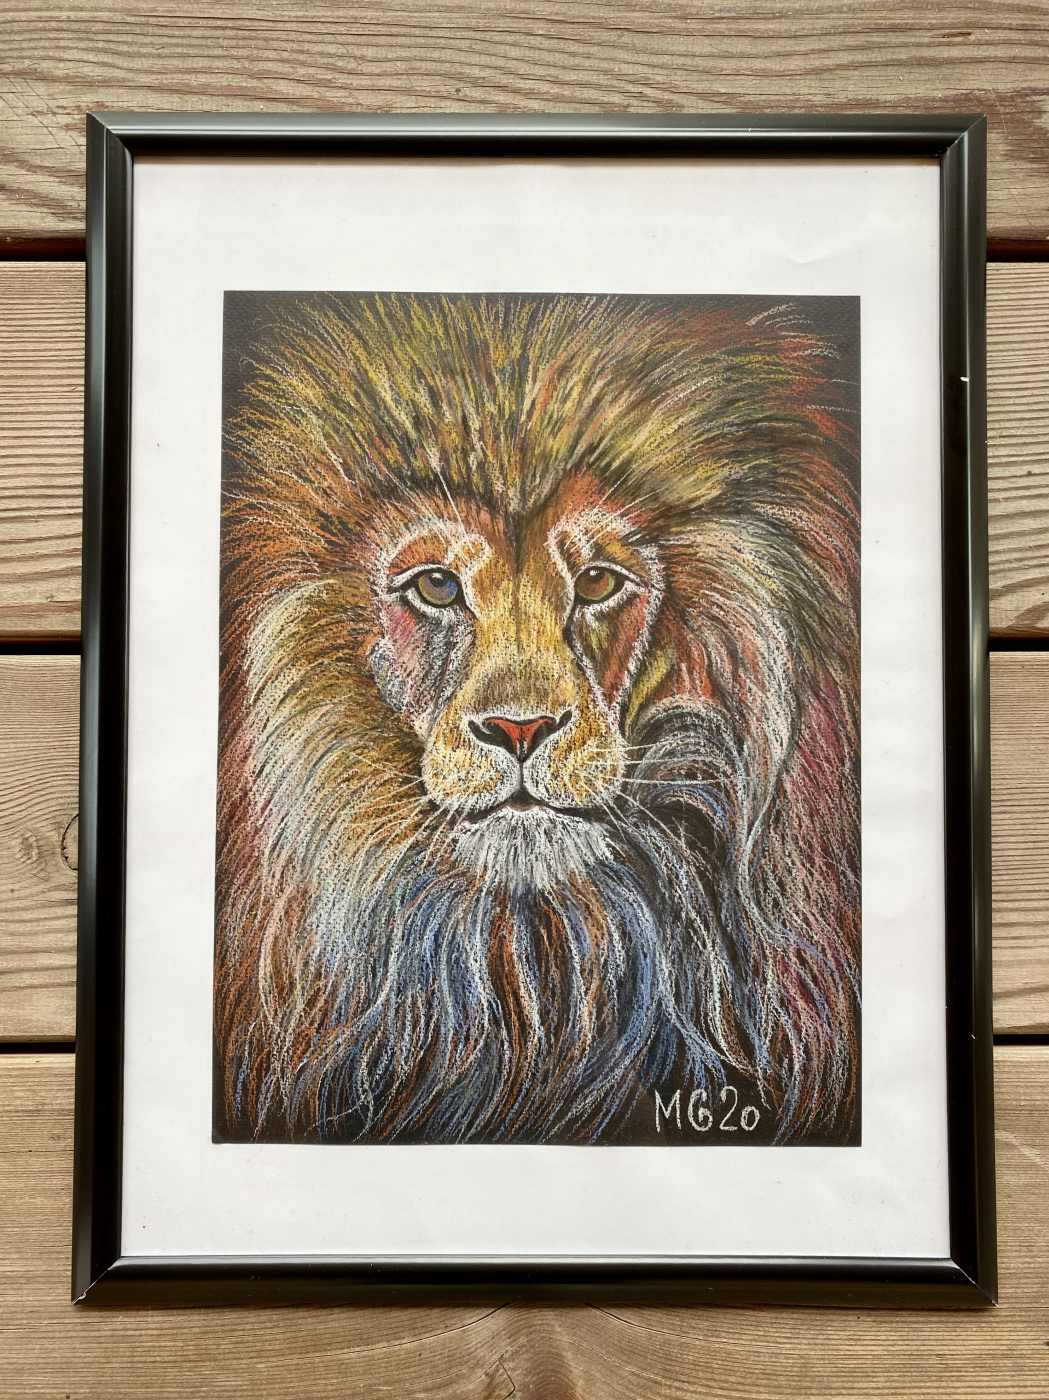 Maria Grekova. Lion king